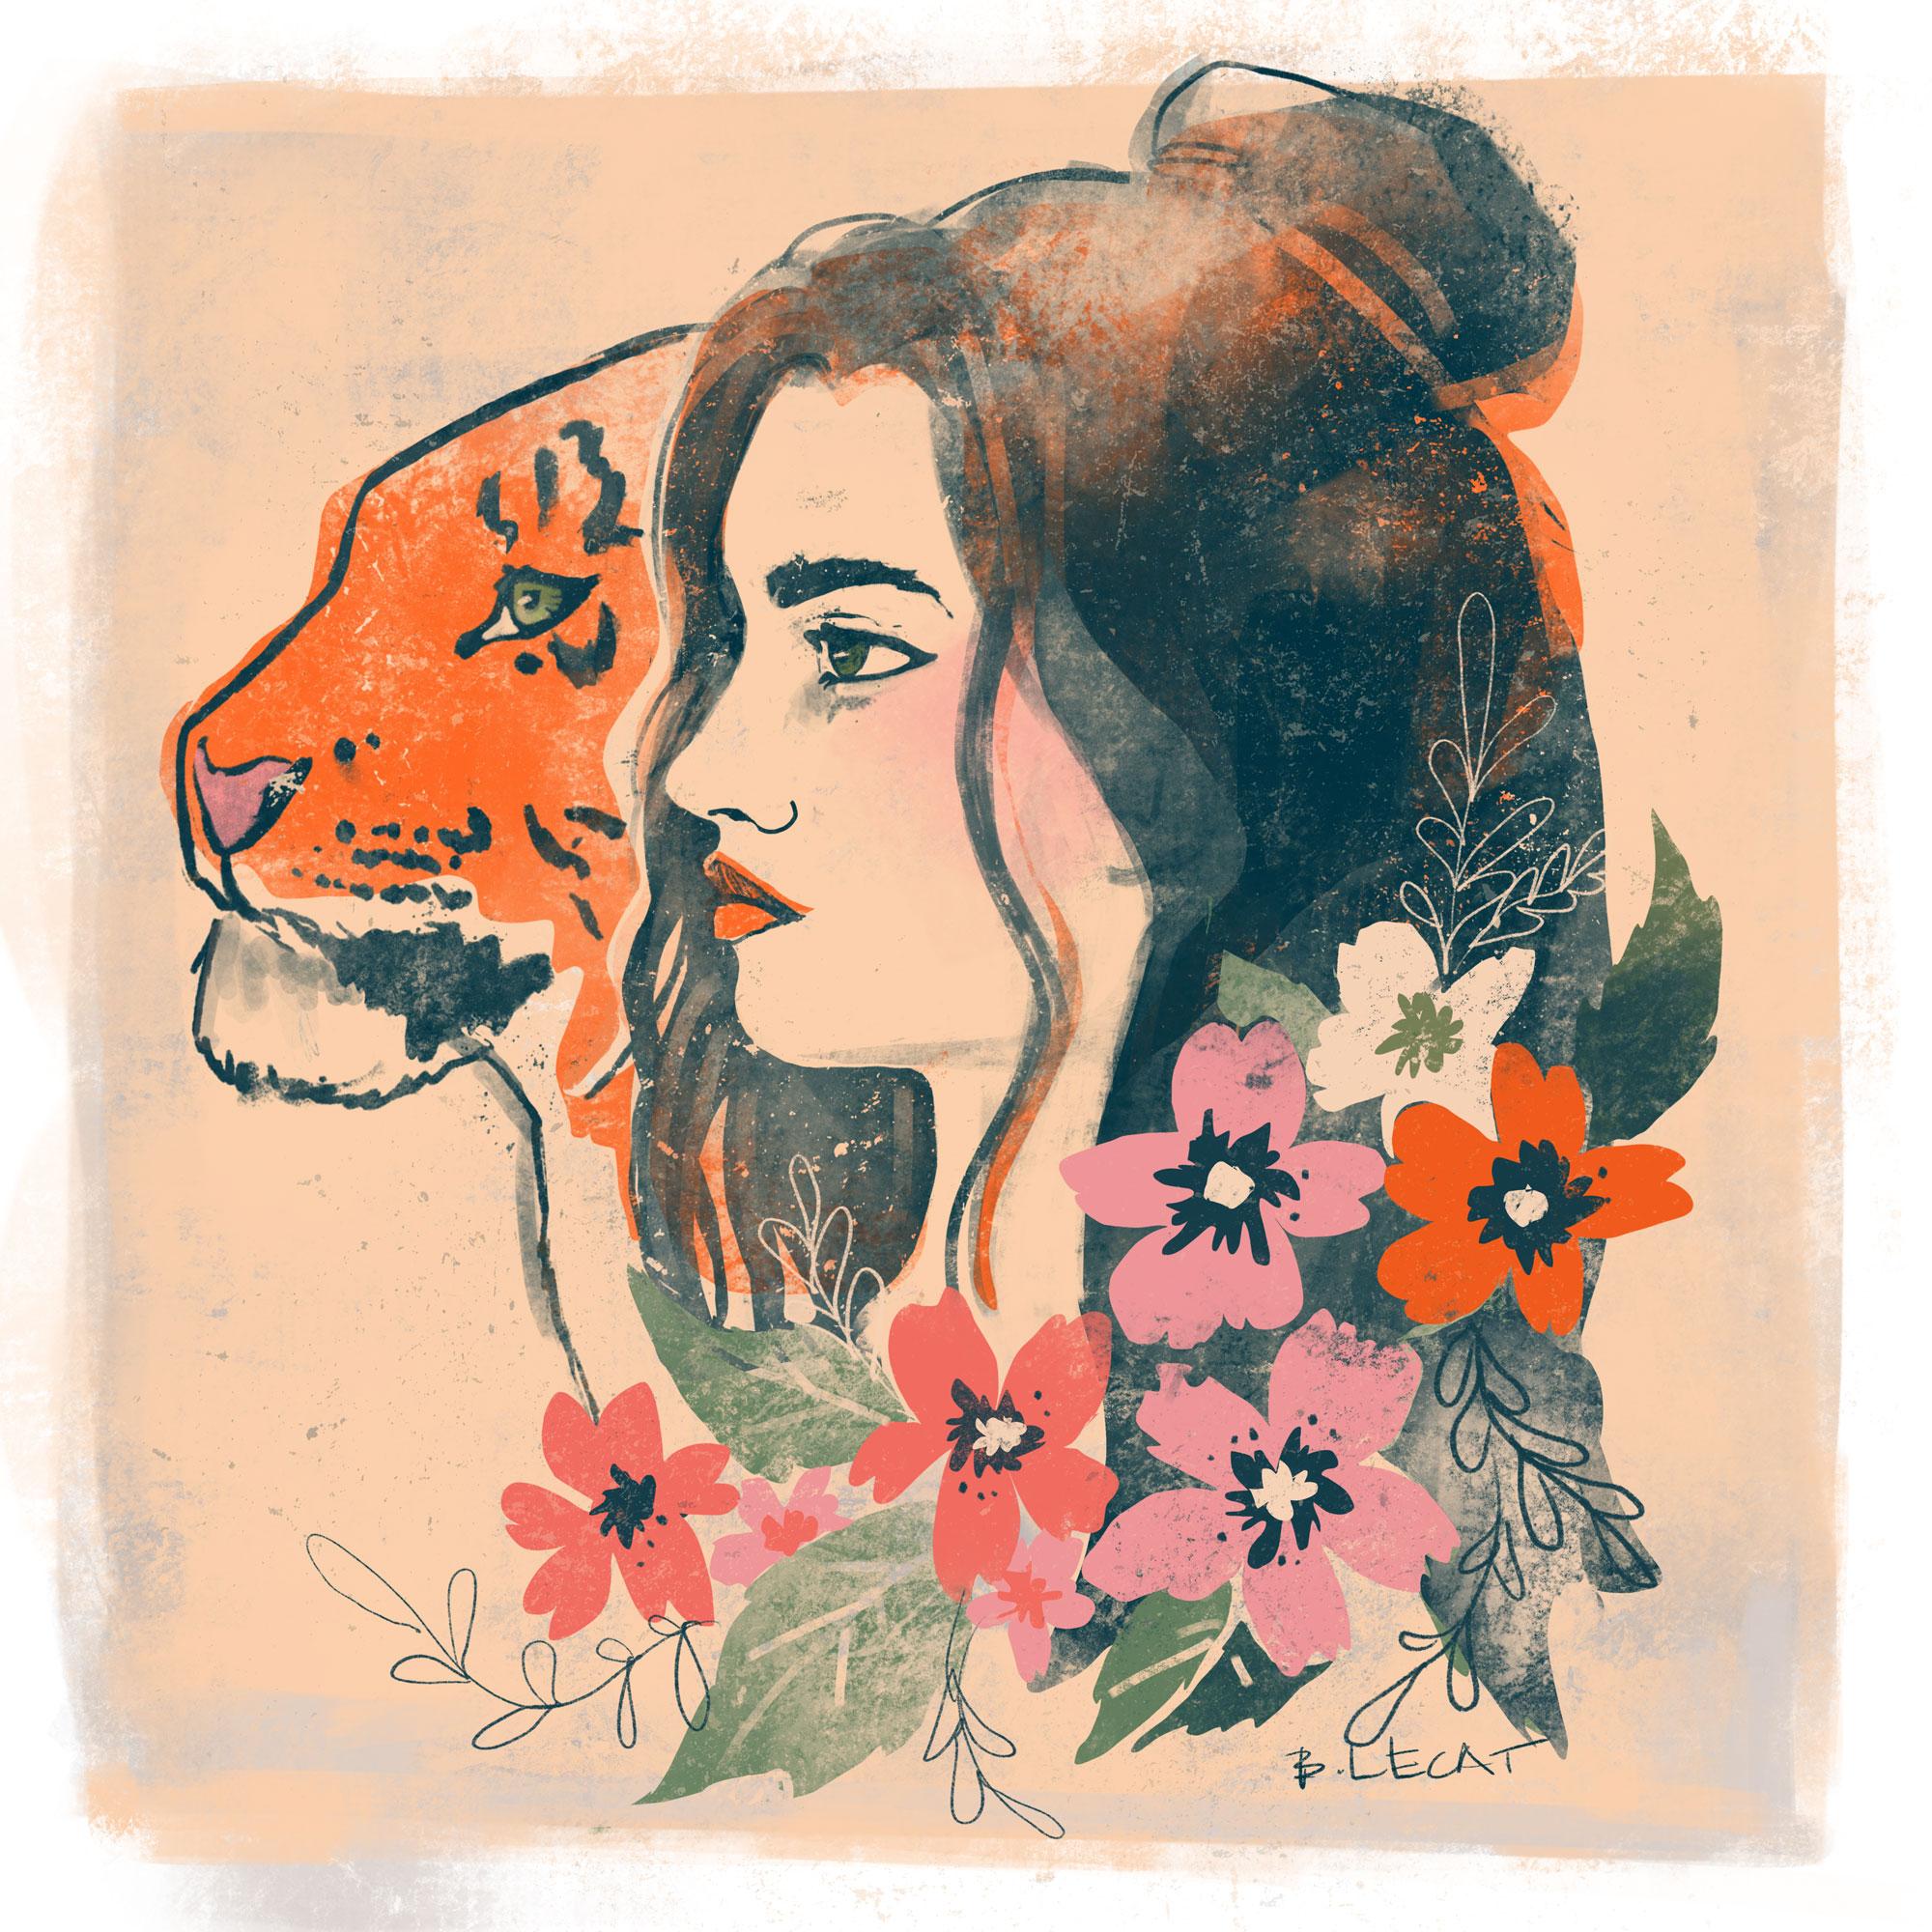 """Hear Me Roar"" by Bonnie Lecat"